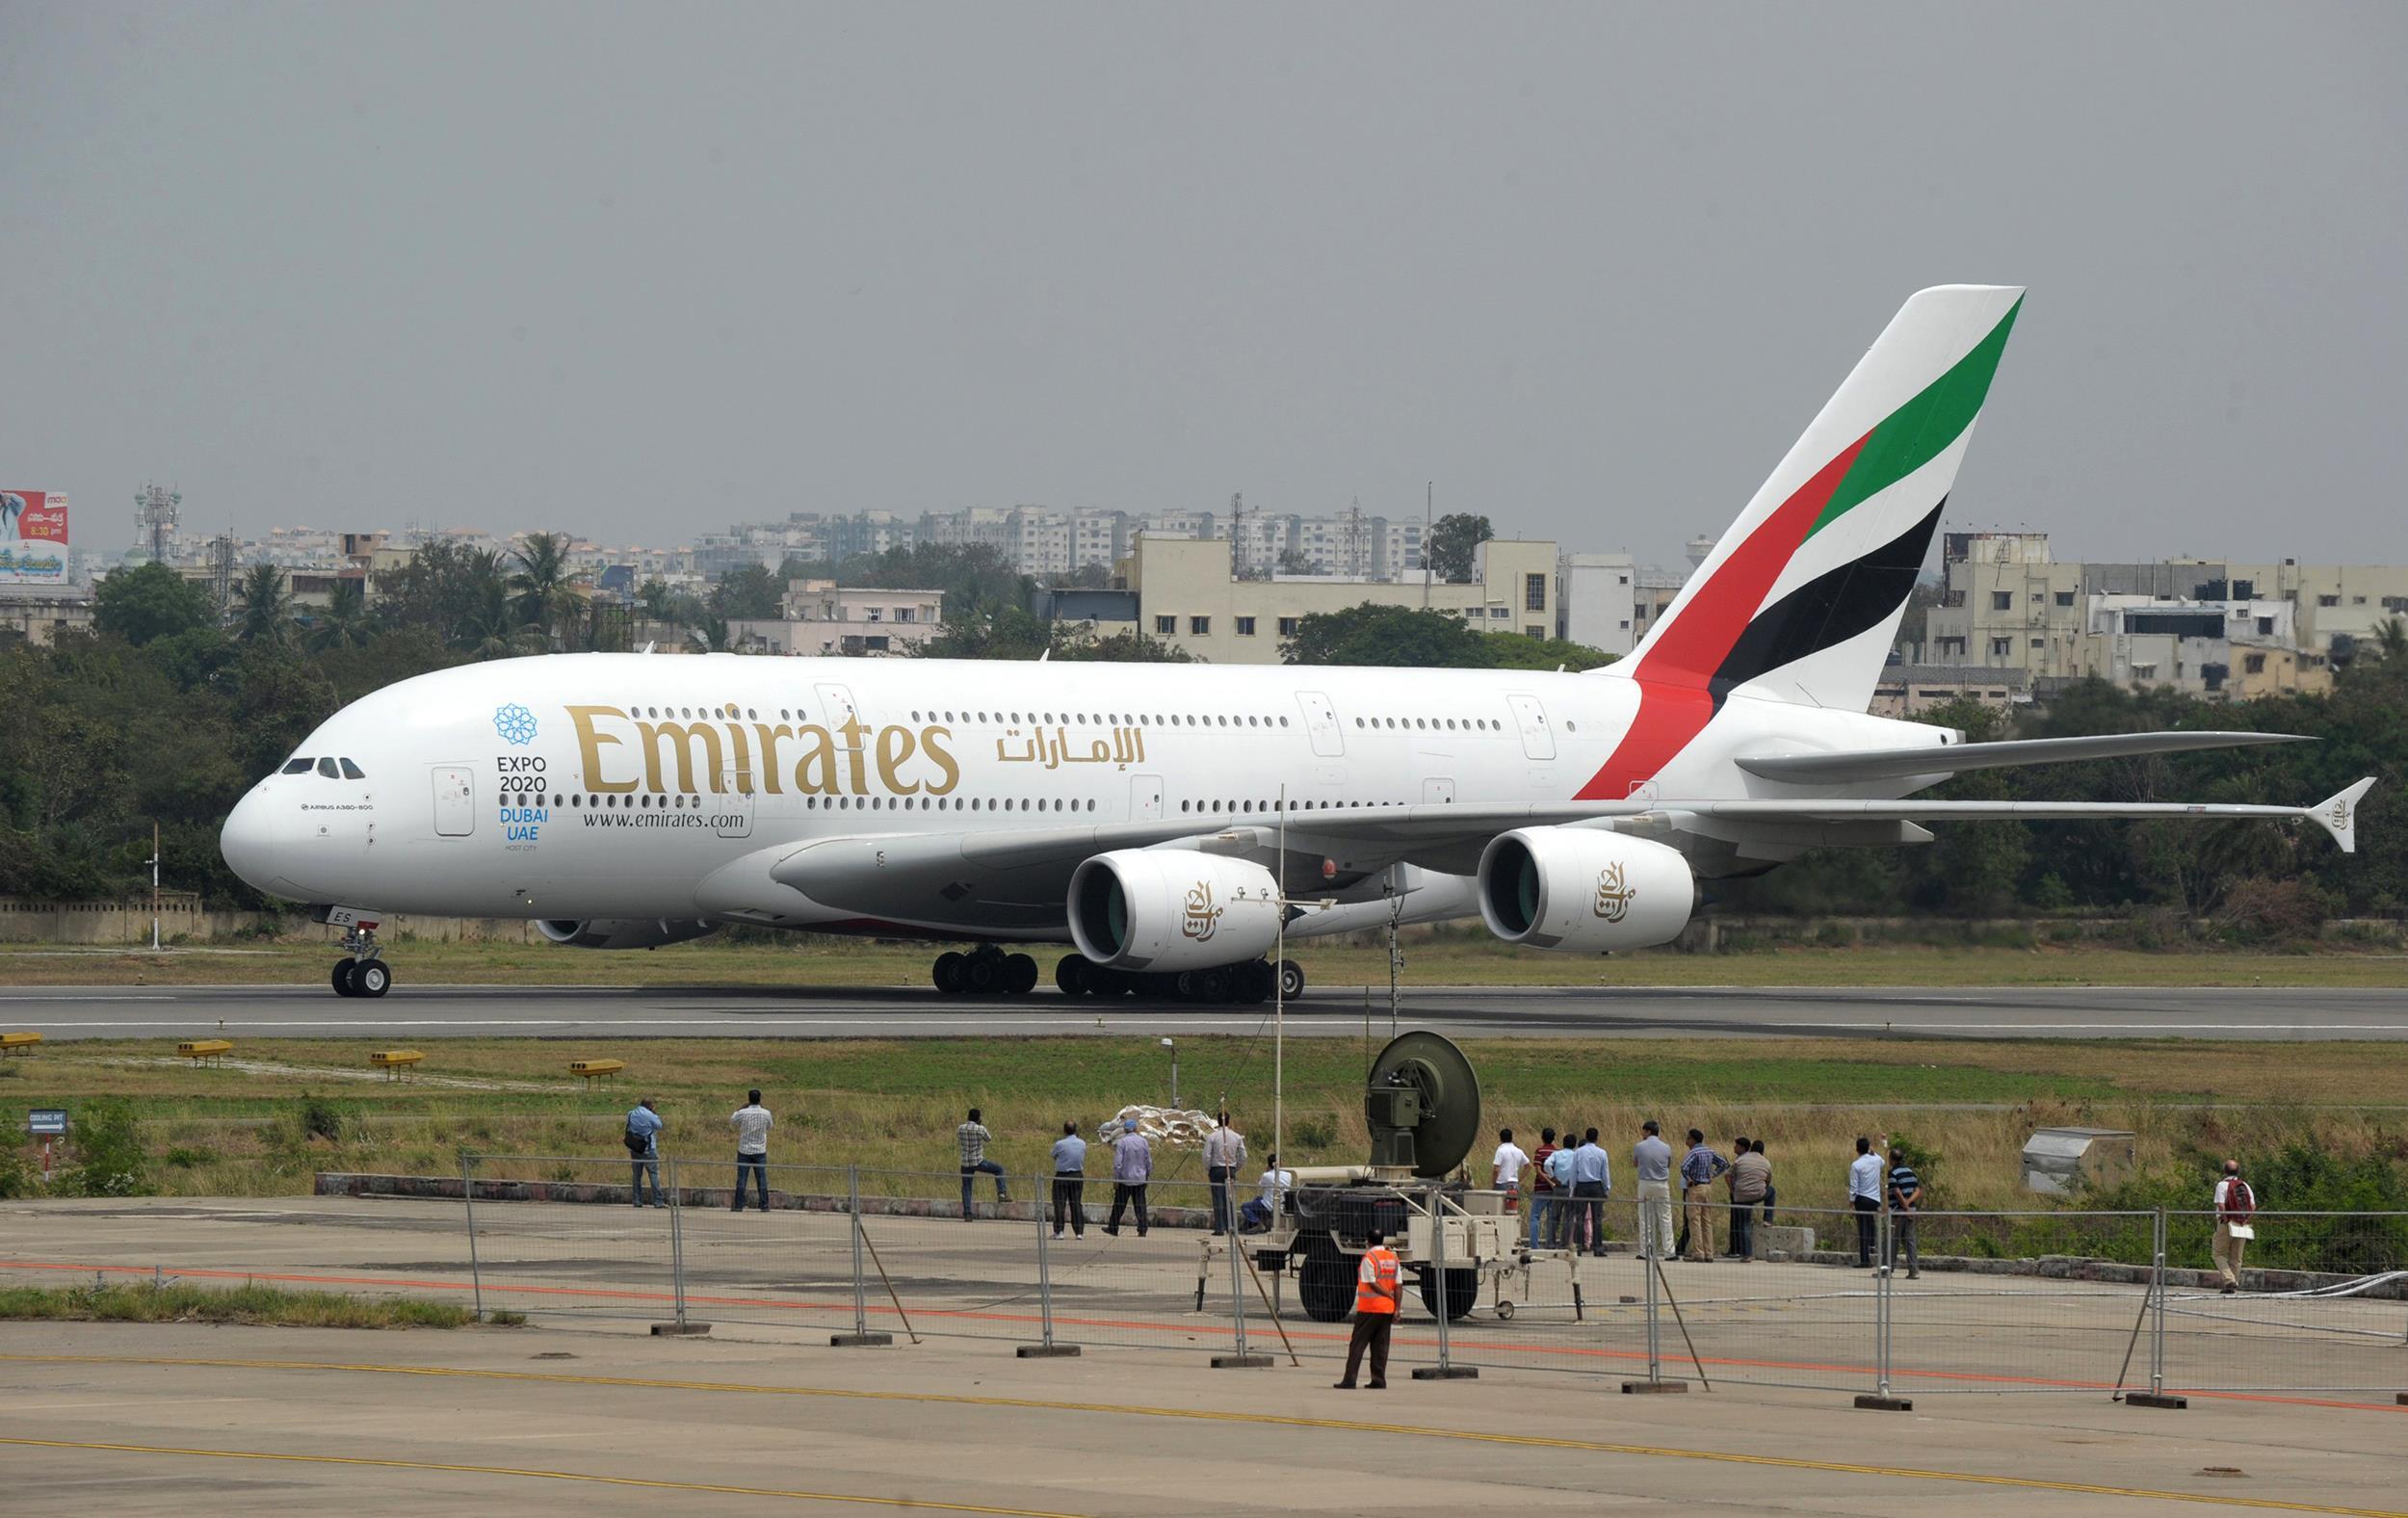 Image: An Emirates plane